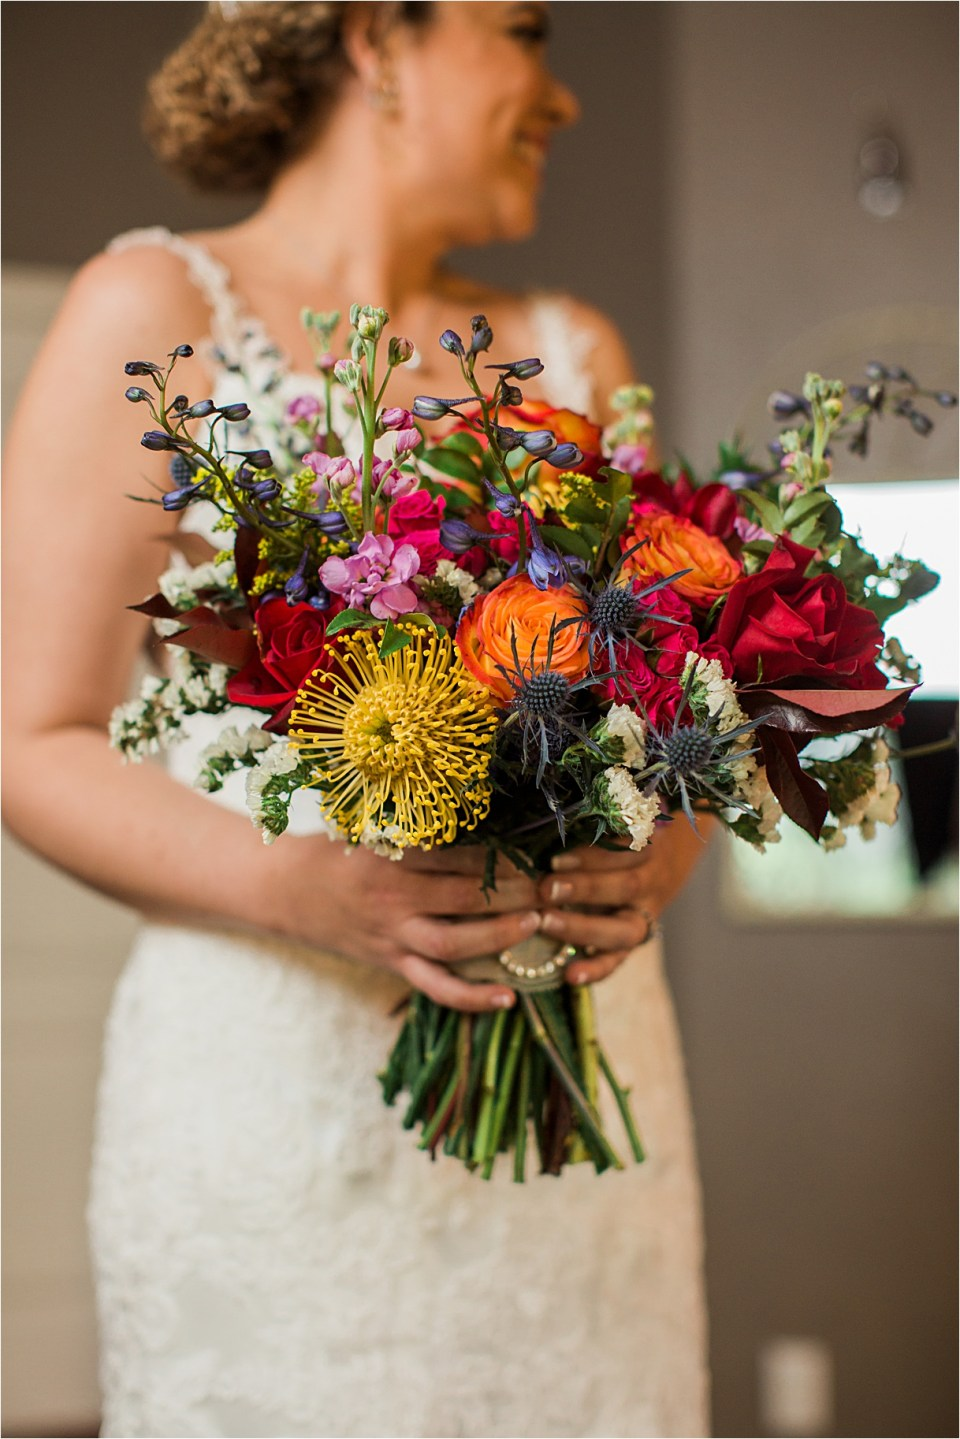 Bridal bouquet from Eastland Alley, Tucson, Arizona.